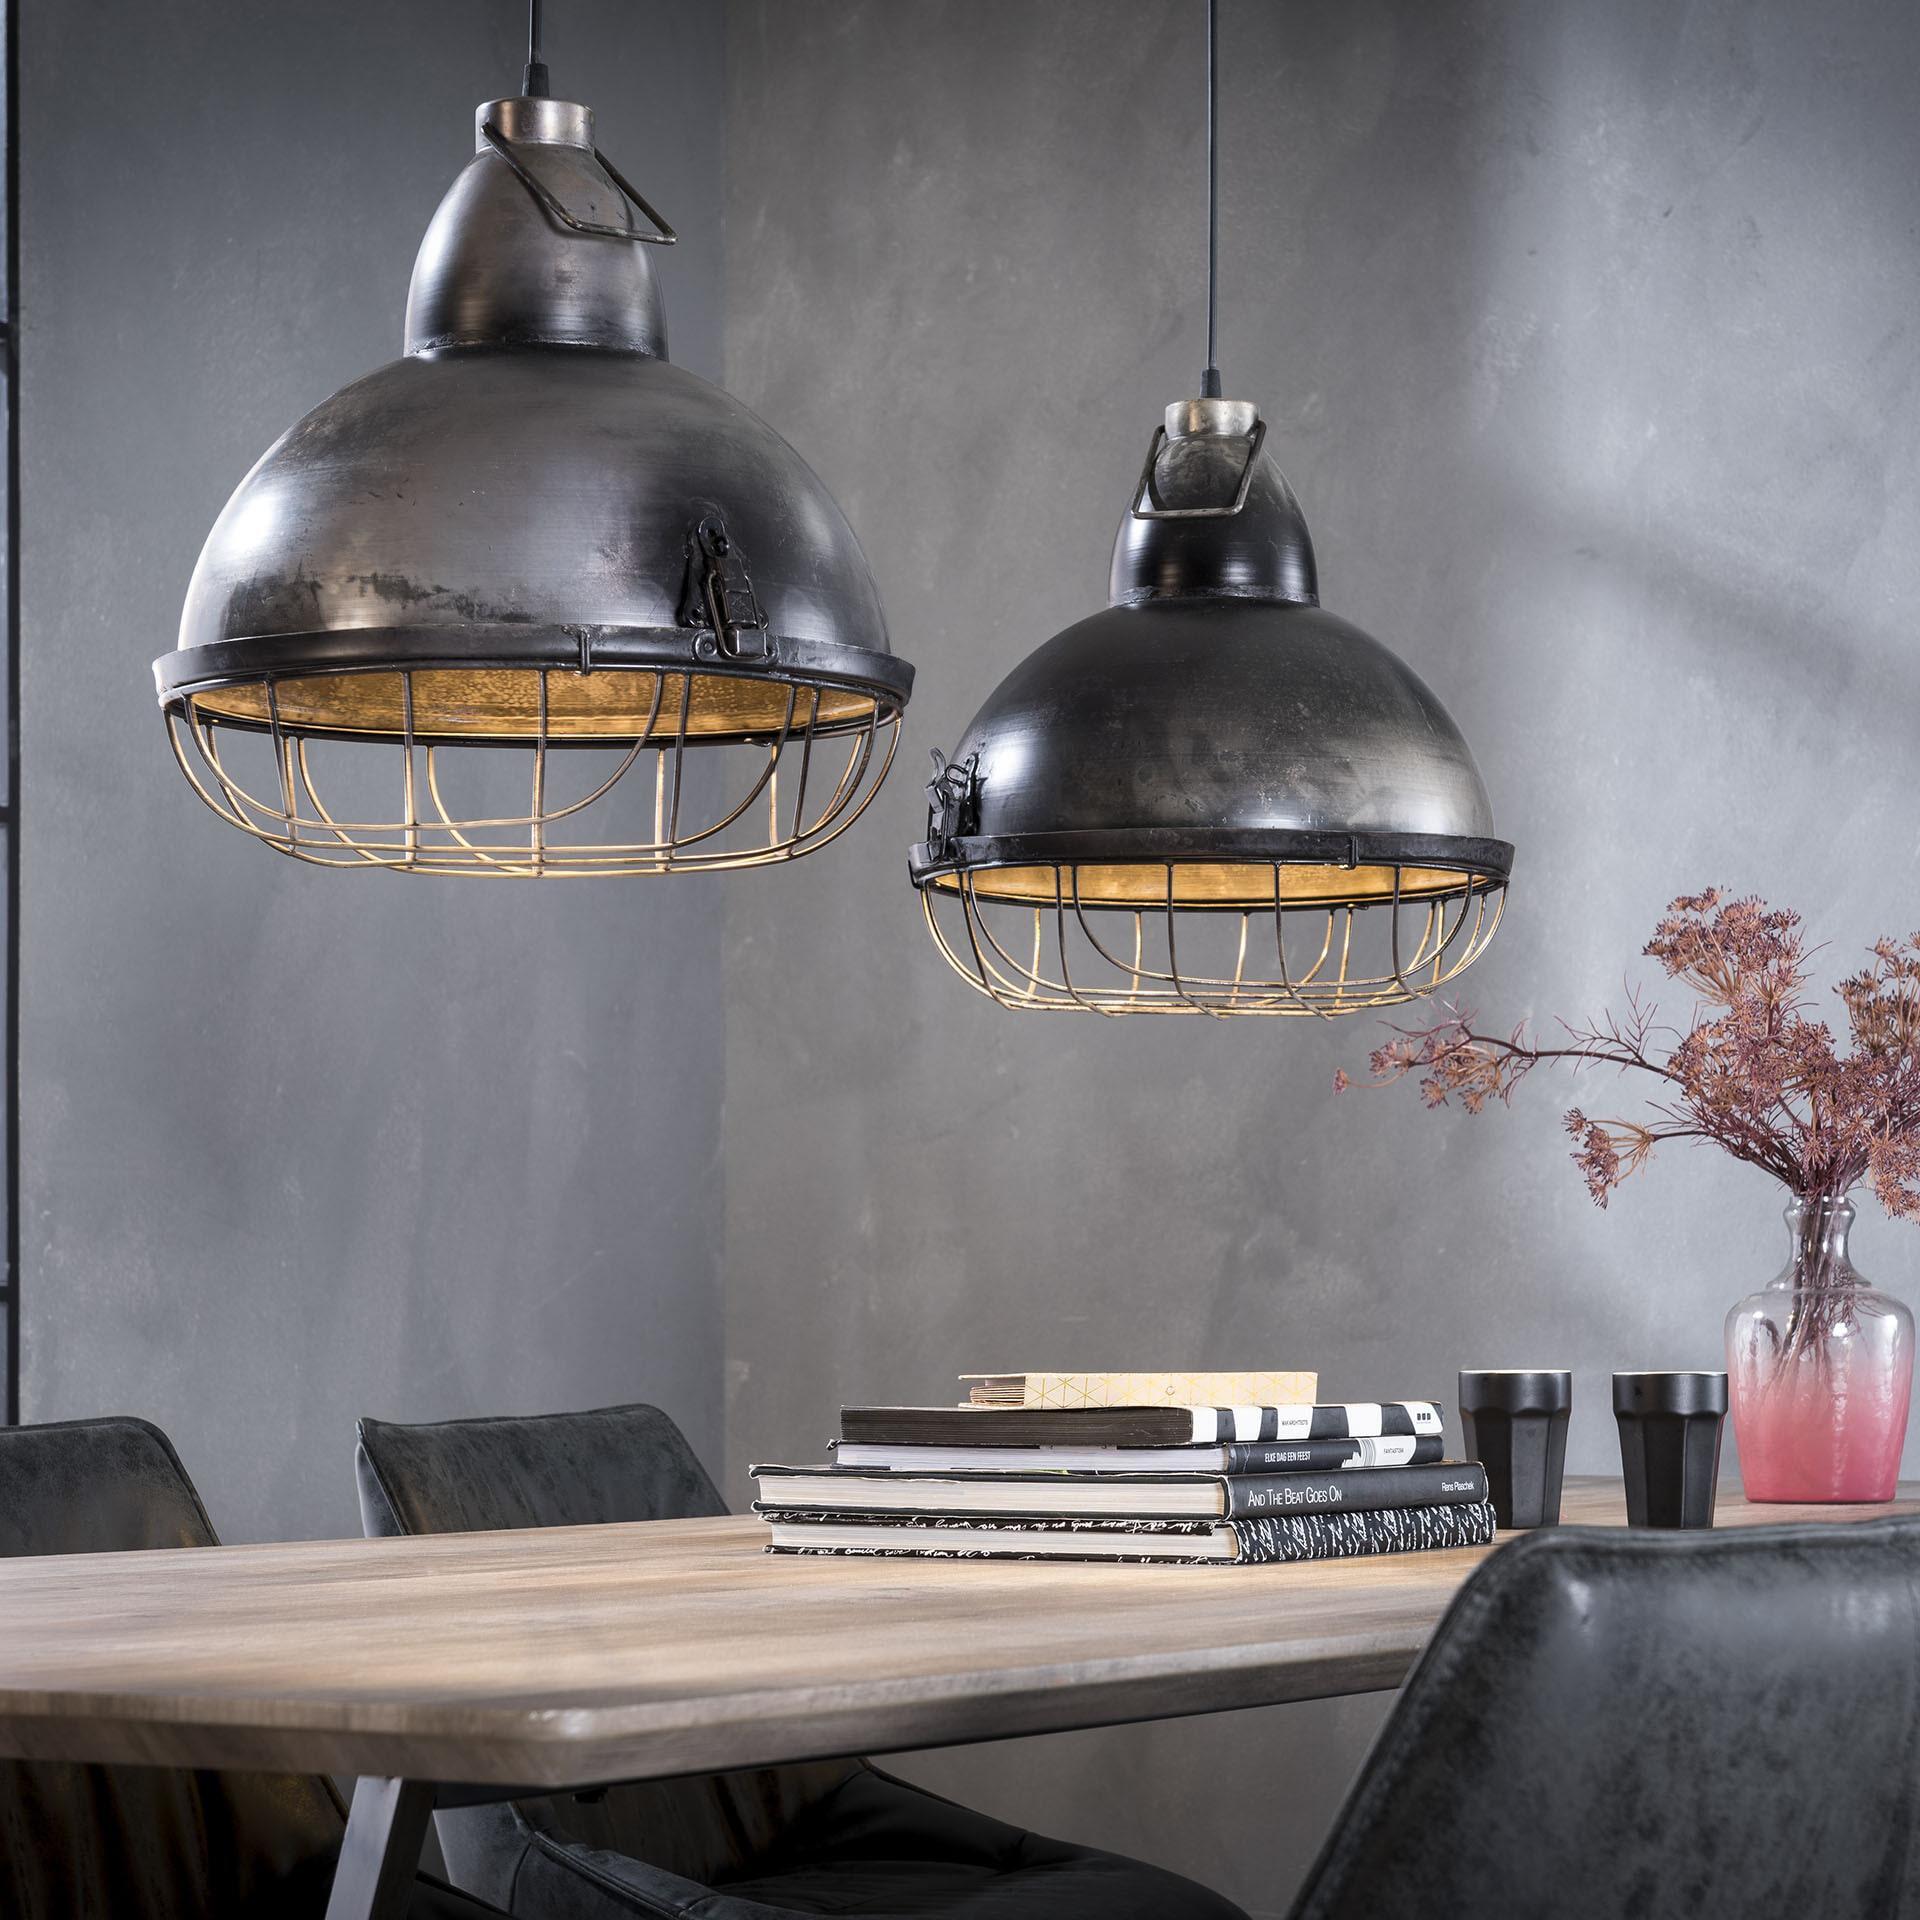 Industri�le Dubbele Hanglamp 'Stephen', 2 x 38cm